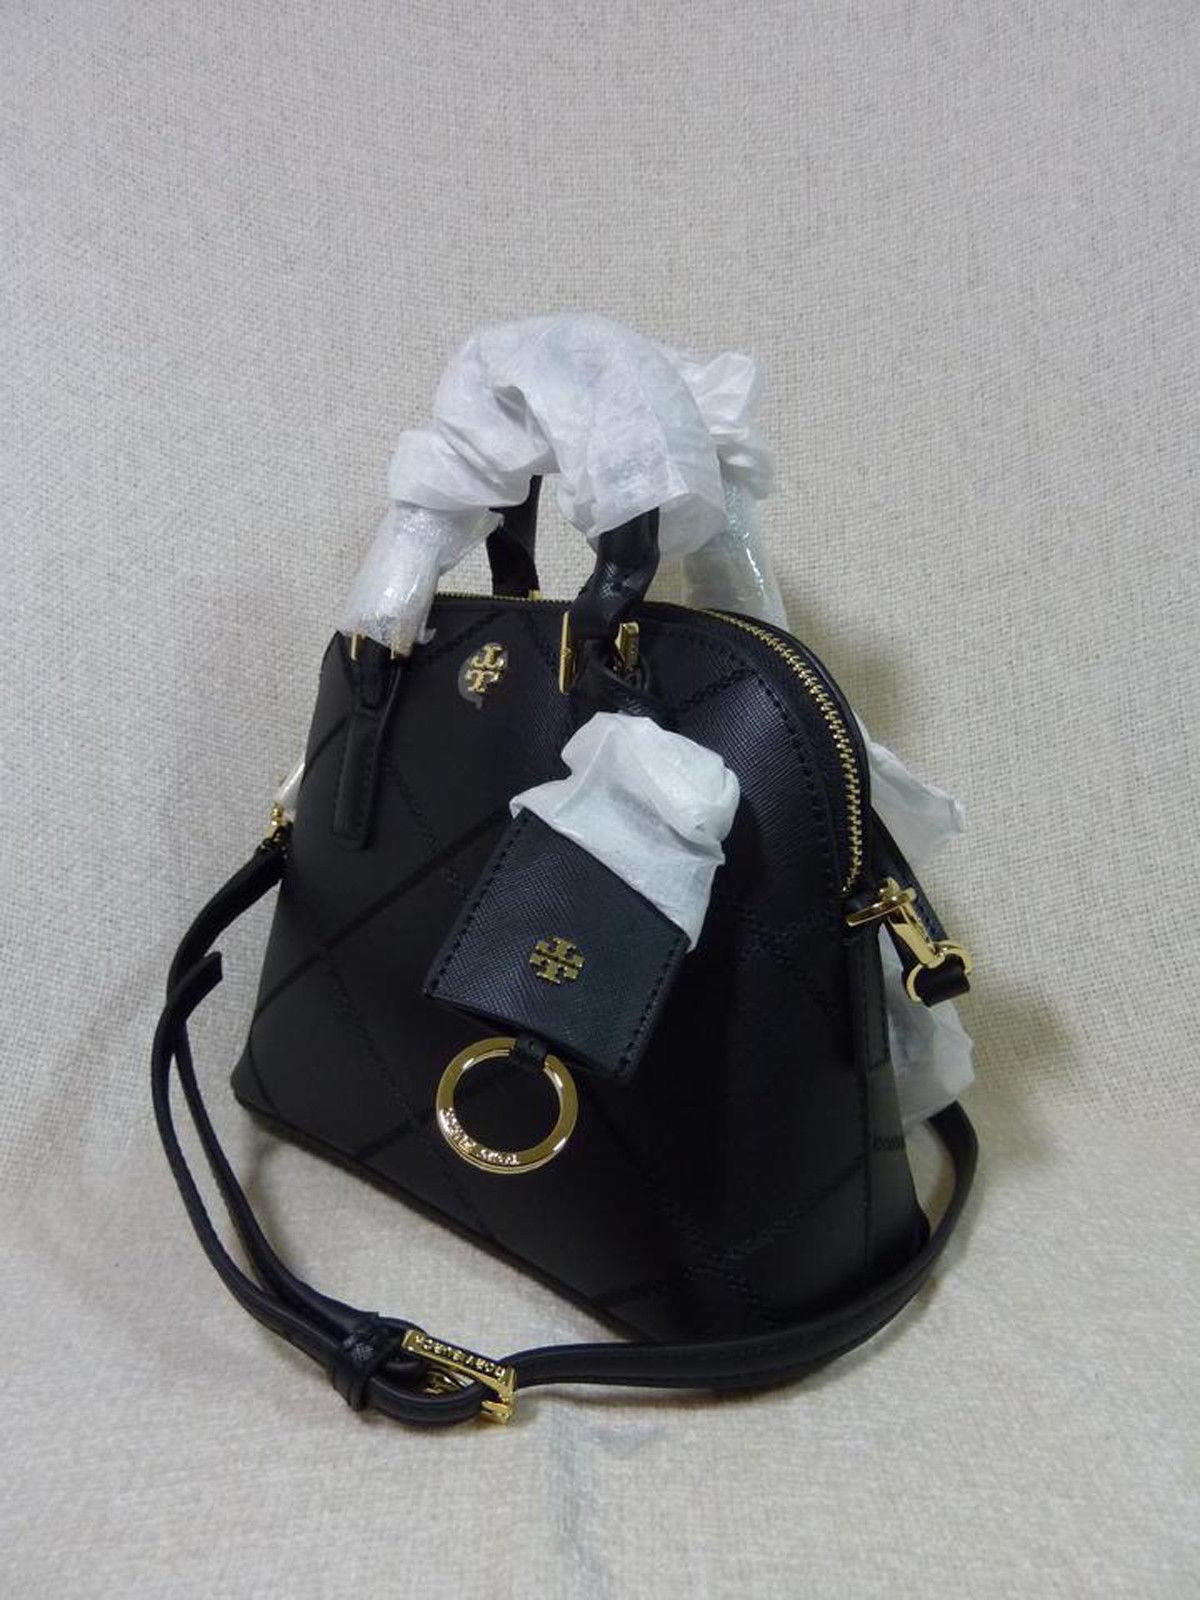 NWT Tory Burch Black Saffiano Mini Robinson Stitched Dome Cross Body Bag  - $425 image 2